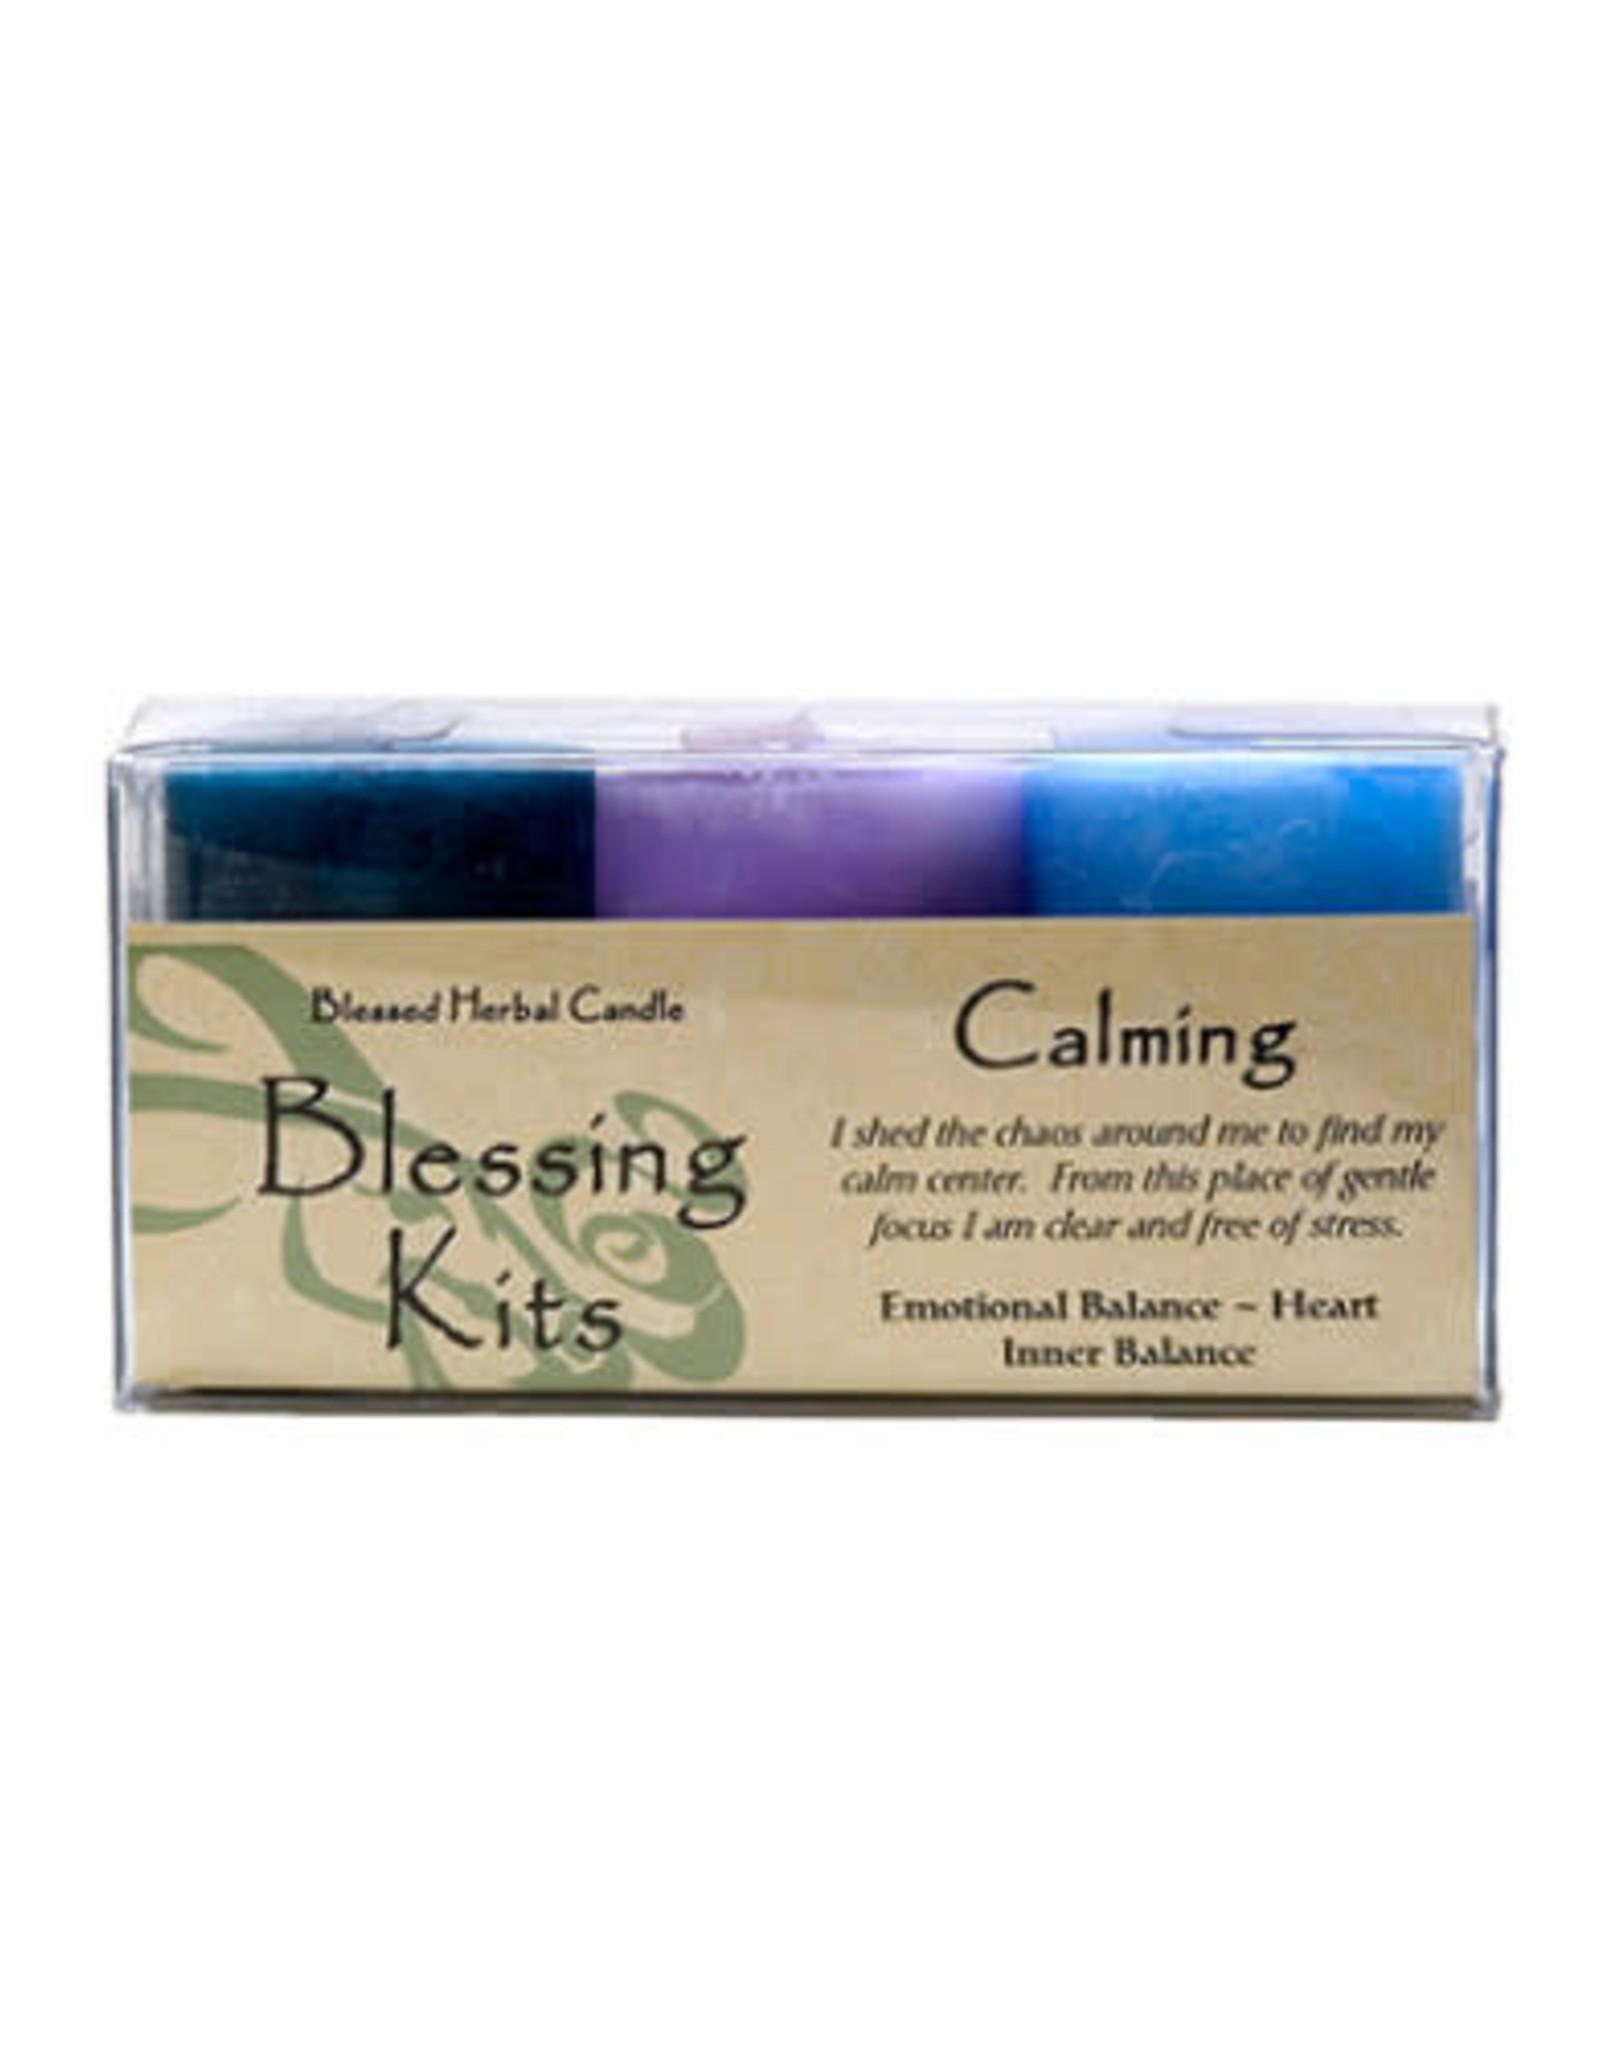 Herbal Calming Candle Kit